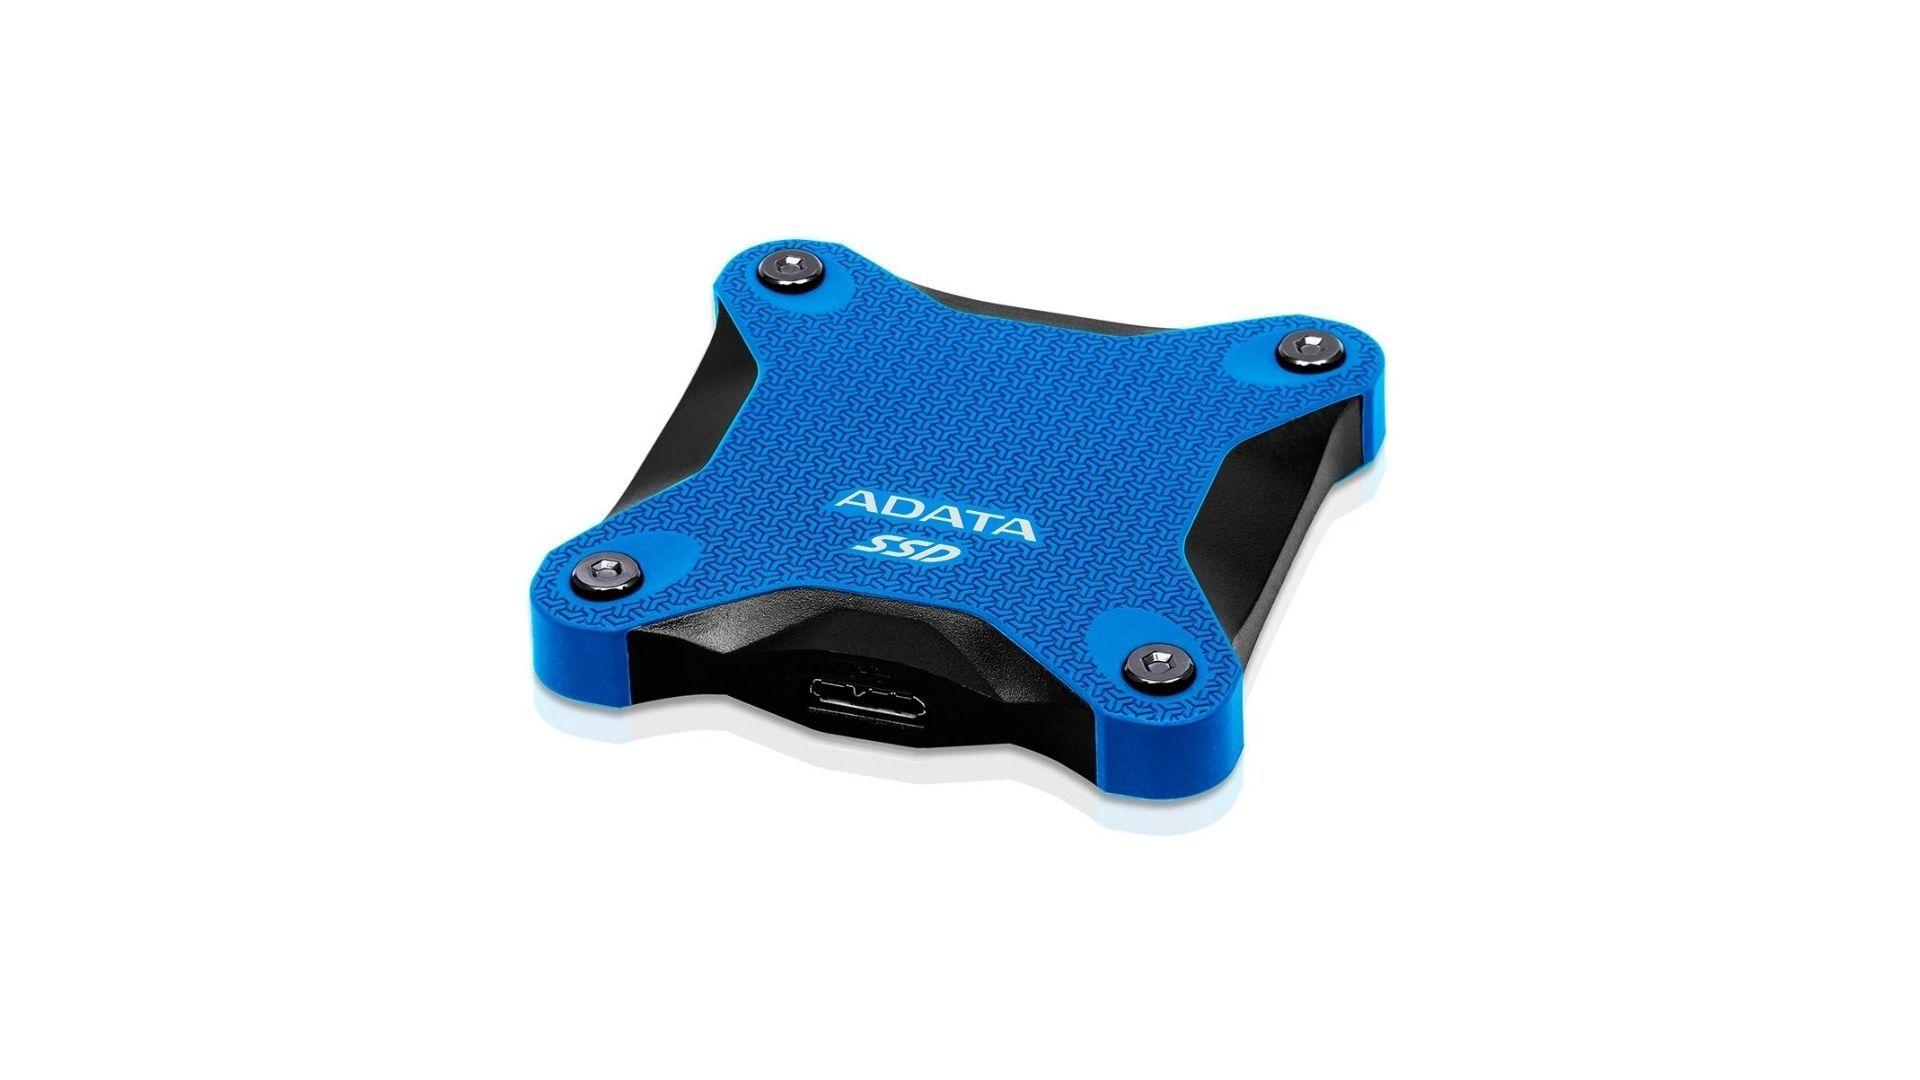 SSD Externo azul da marca Adata